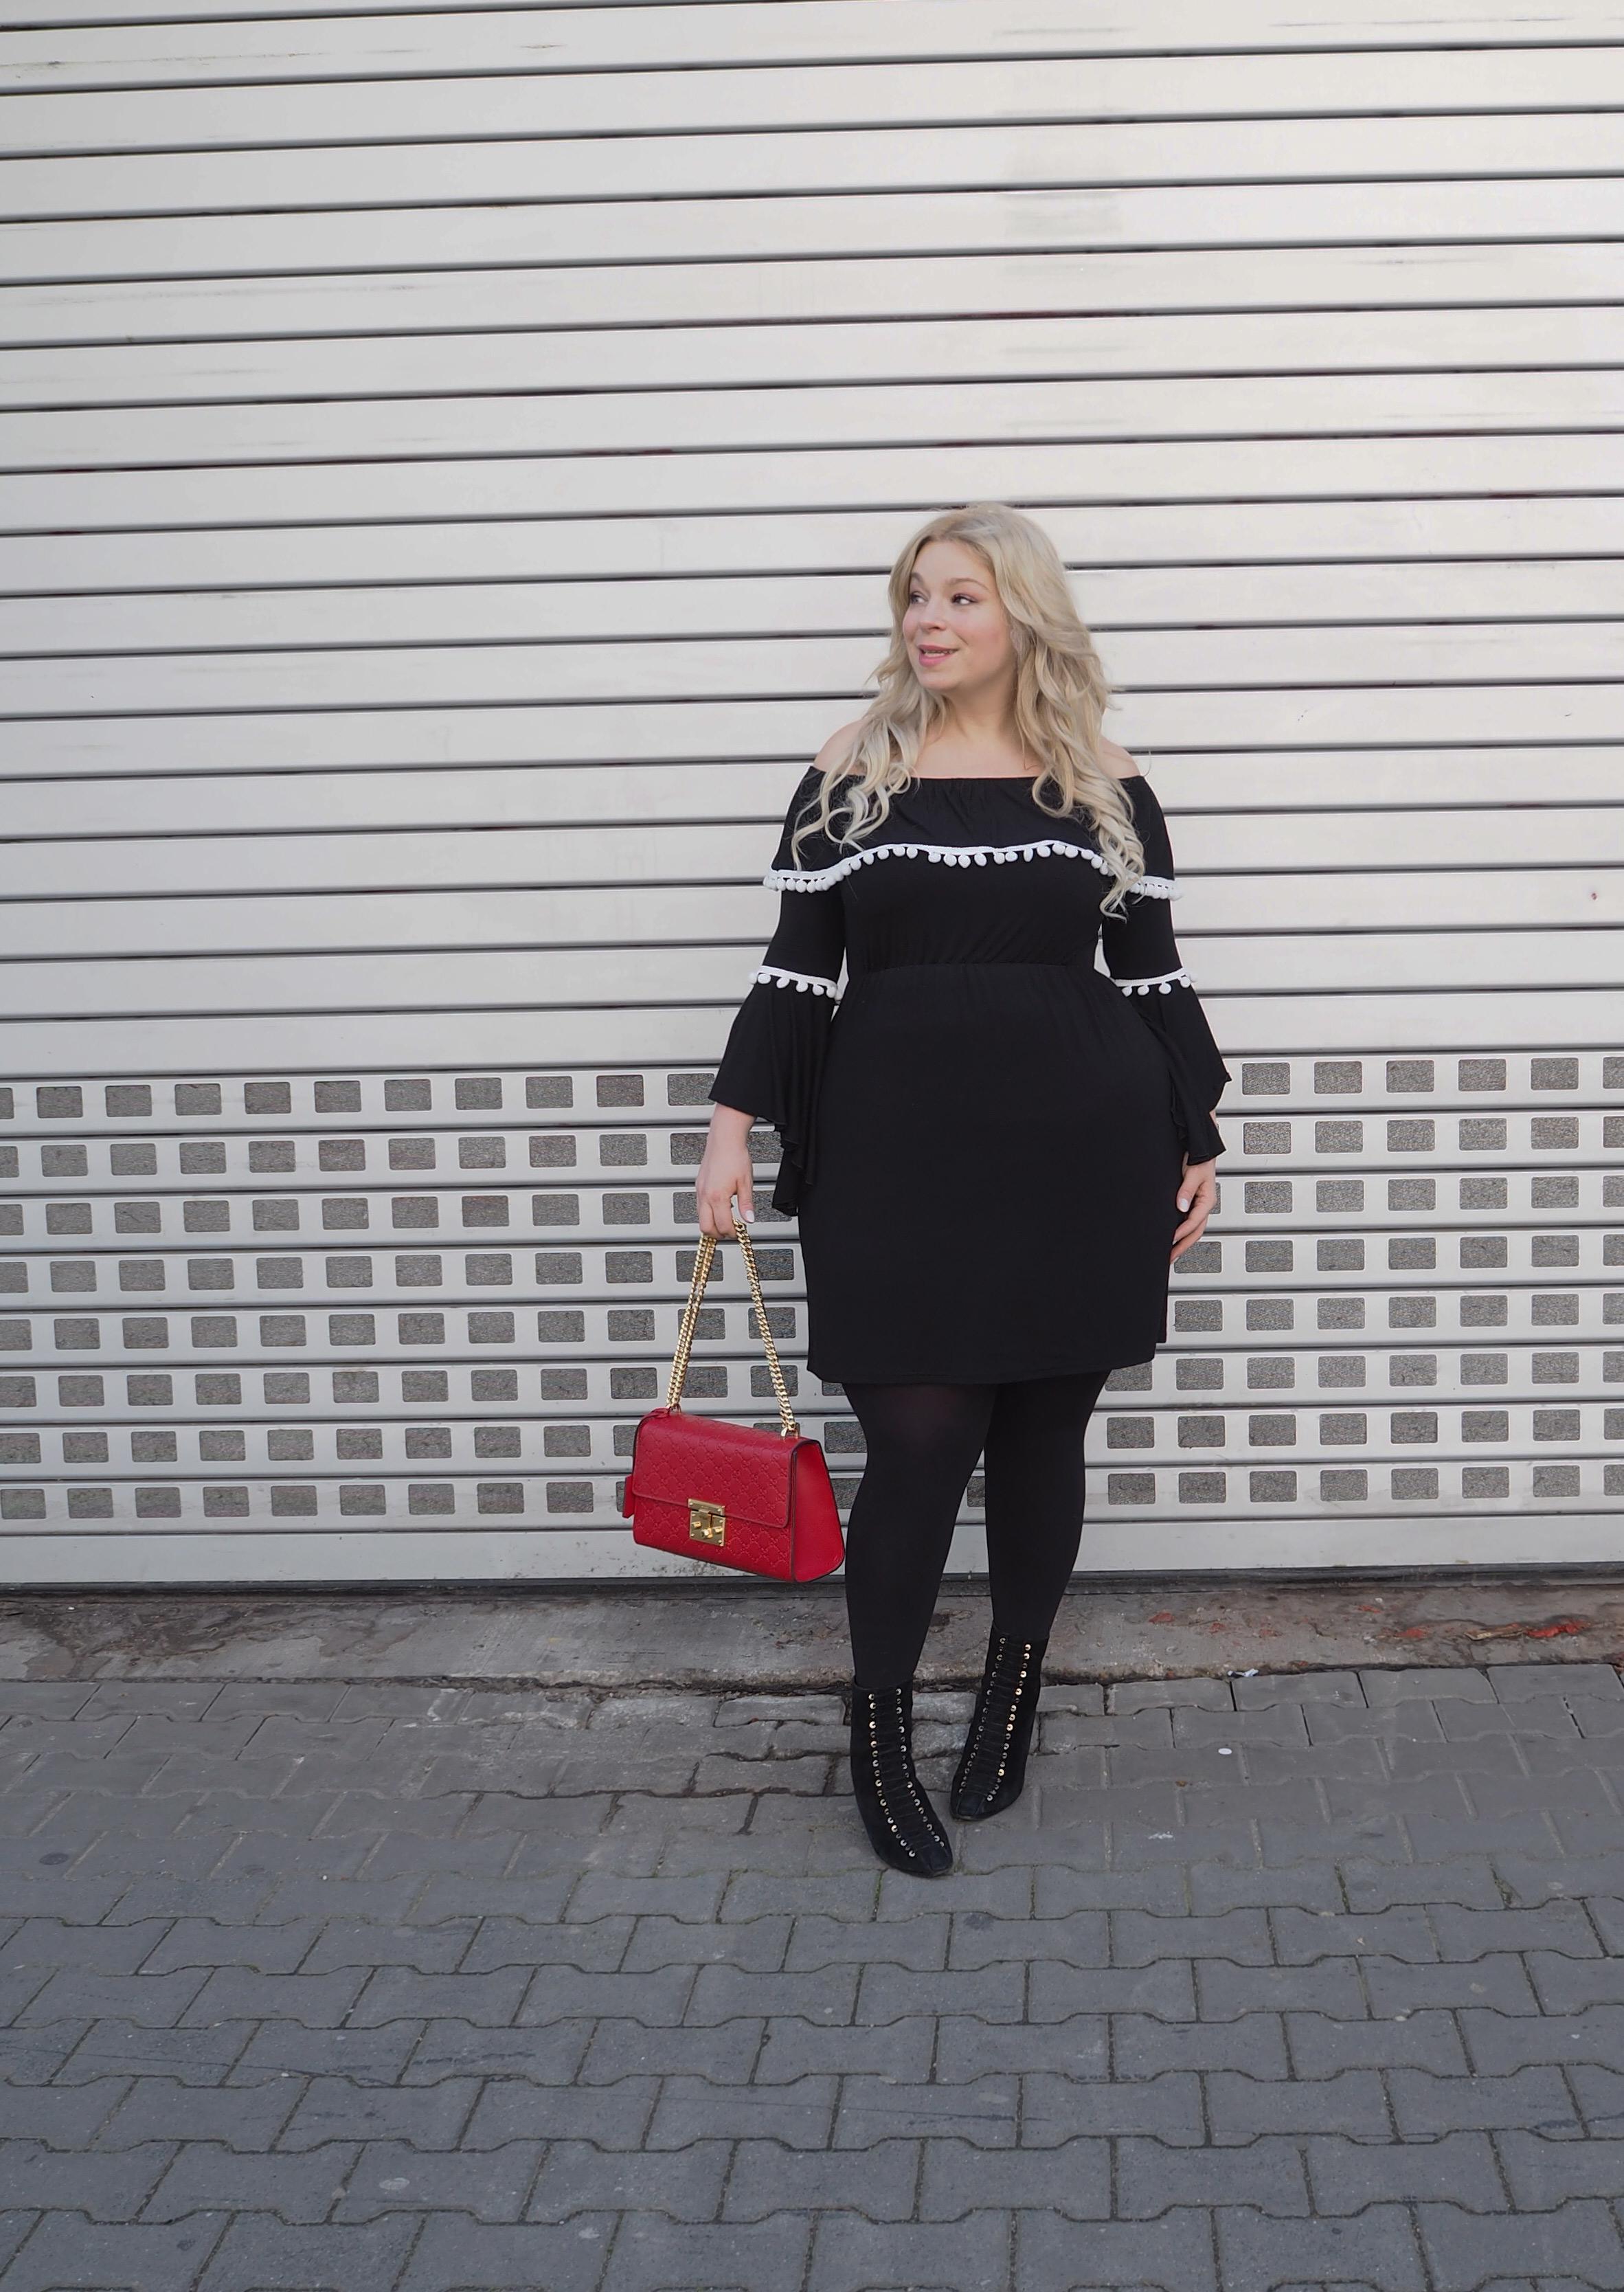 Megabambi-Caterina-outfit-trend-2017-pogorzelski-Sommer-Curvy